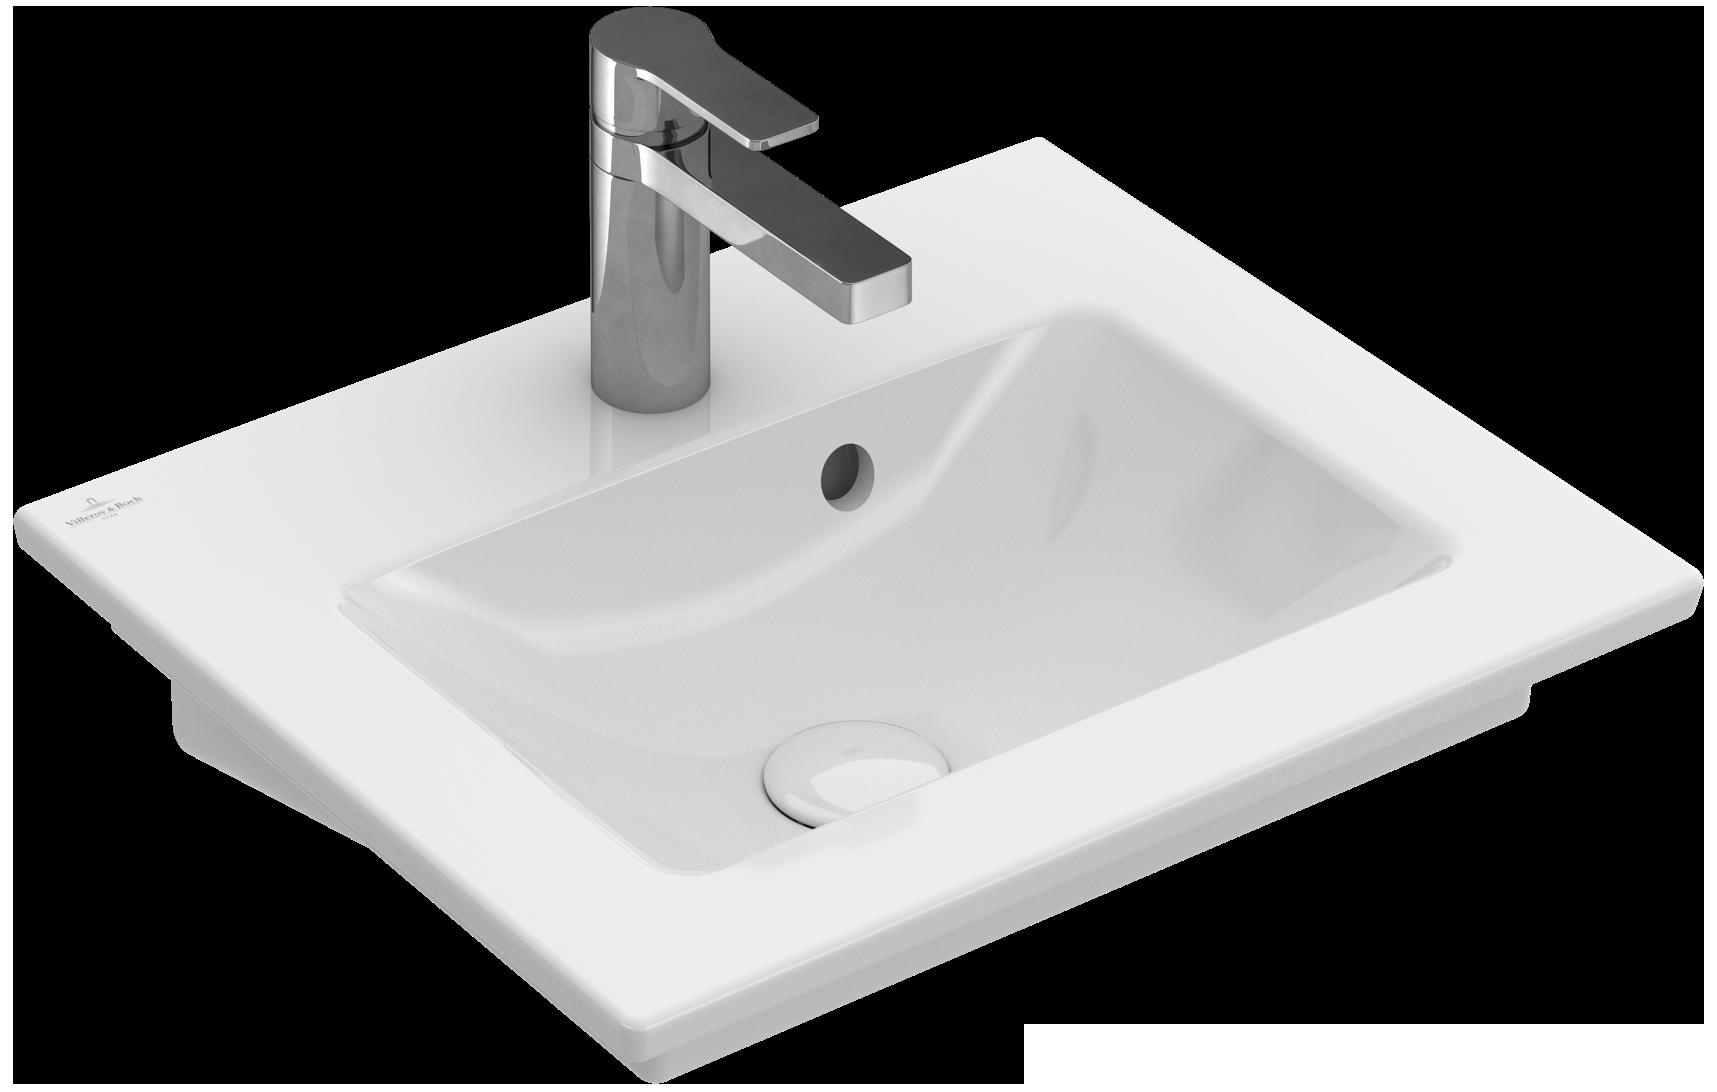 venticello handwaschbecken eckig 412450 villeroy boch. Black Bedroom Furniture Sets. Home Design Ideas